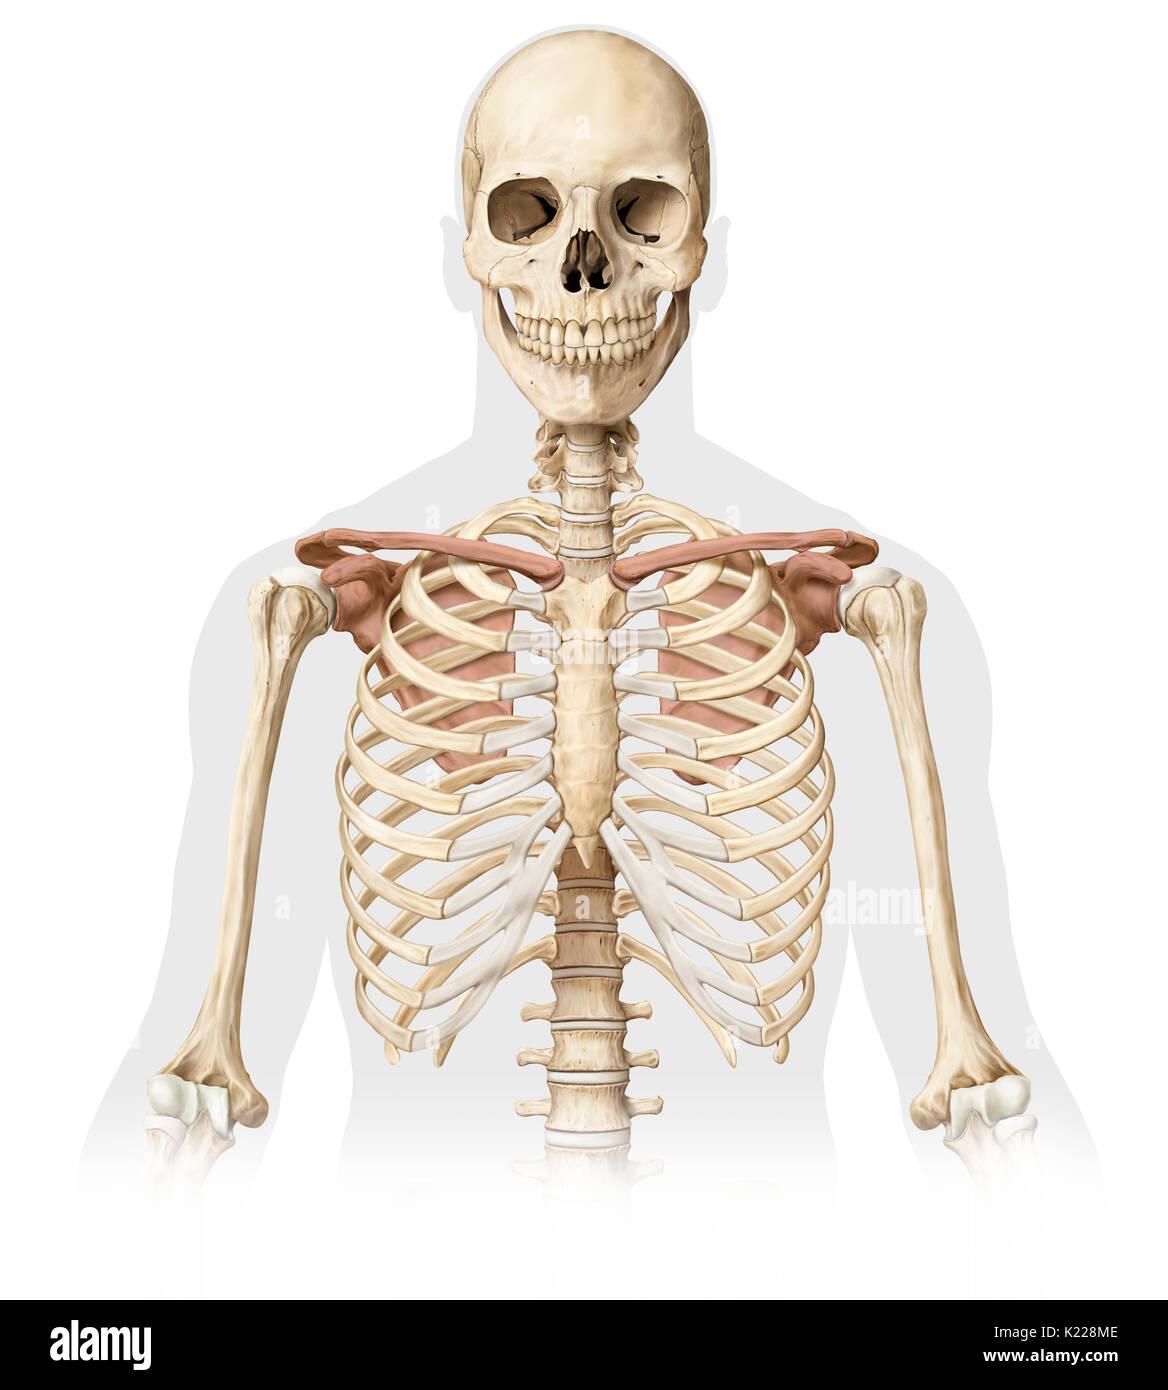 Upper Body Bones Parts Stock Photos Upper Body Bones Parts Stock